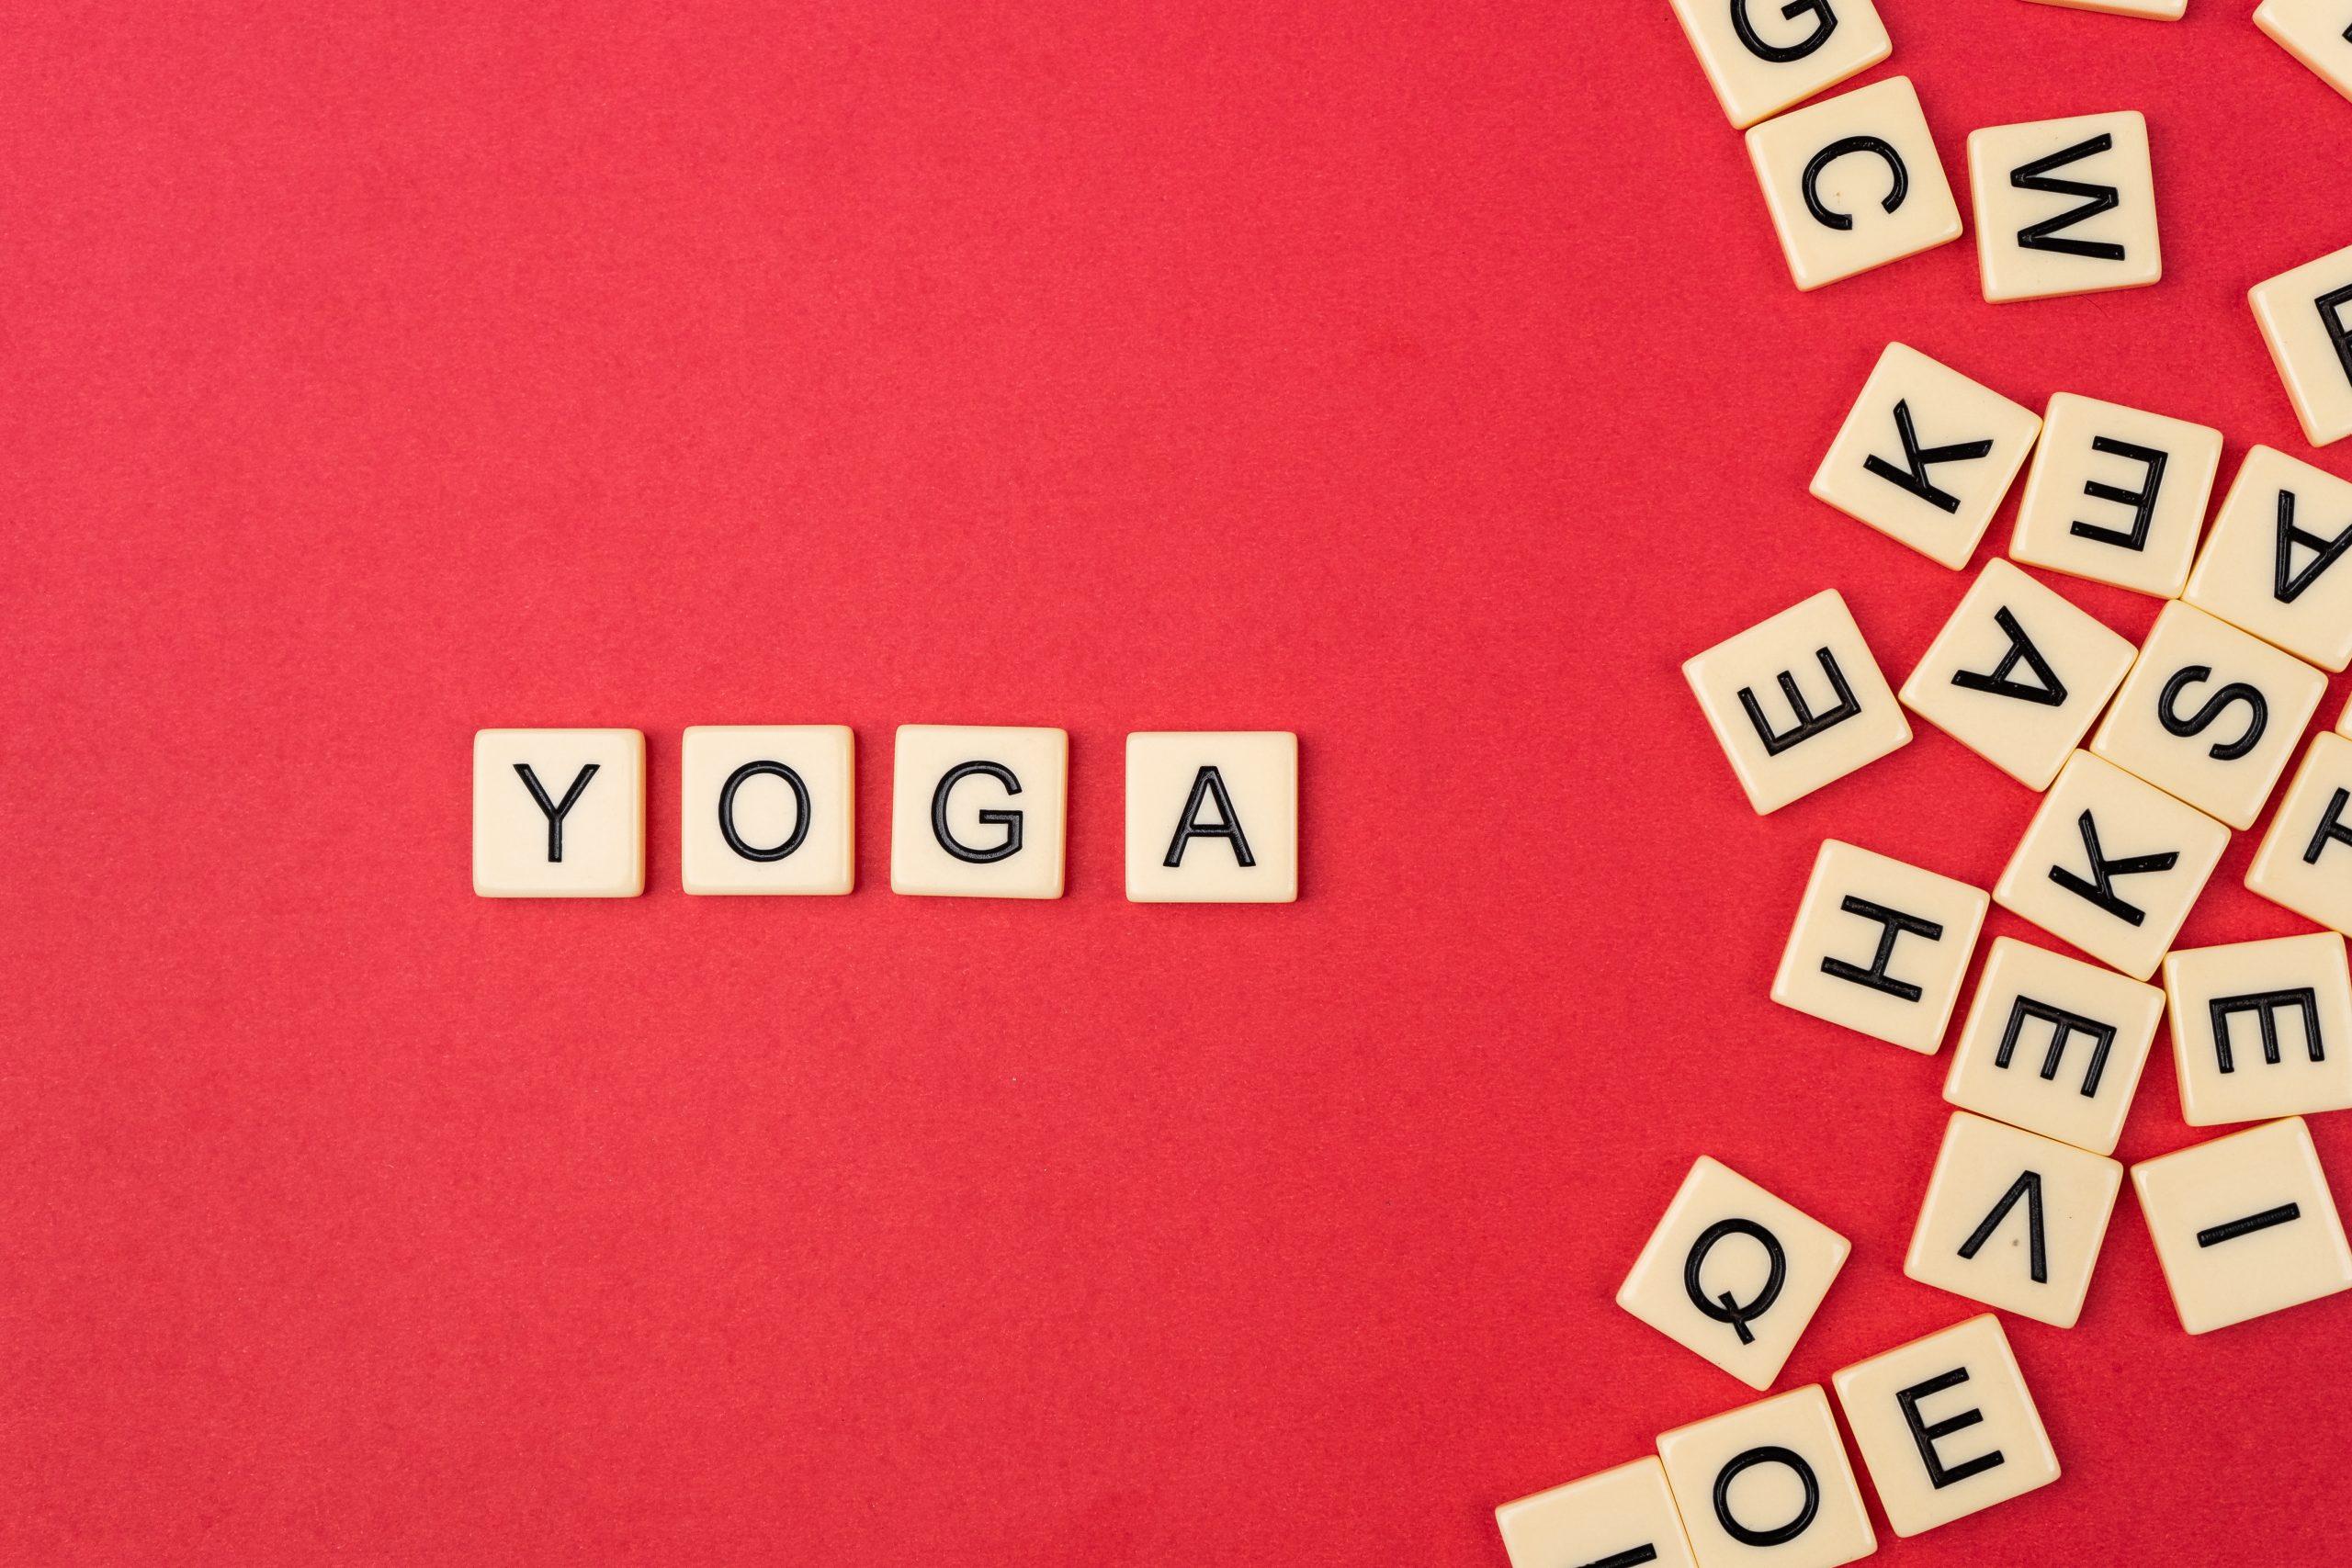 Yoga written with scrabble